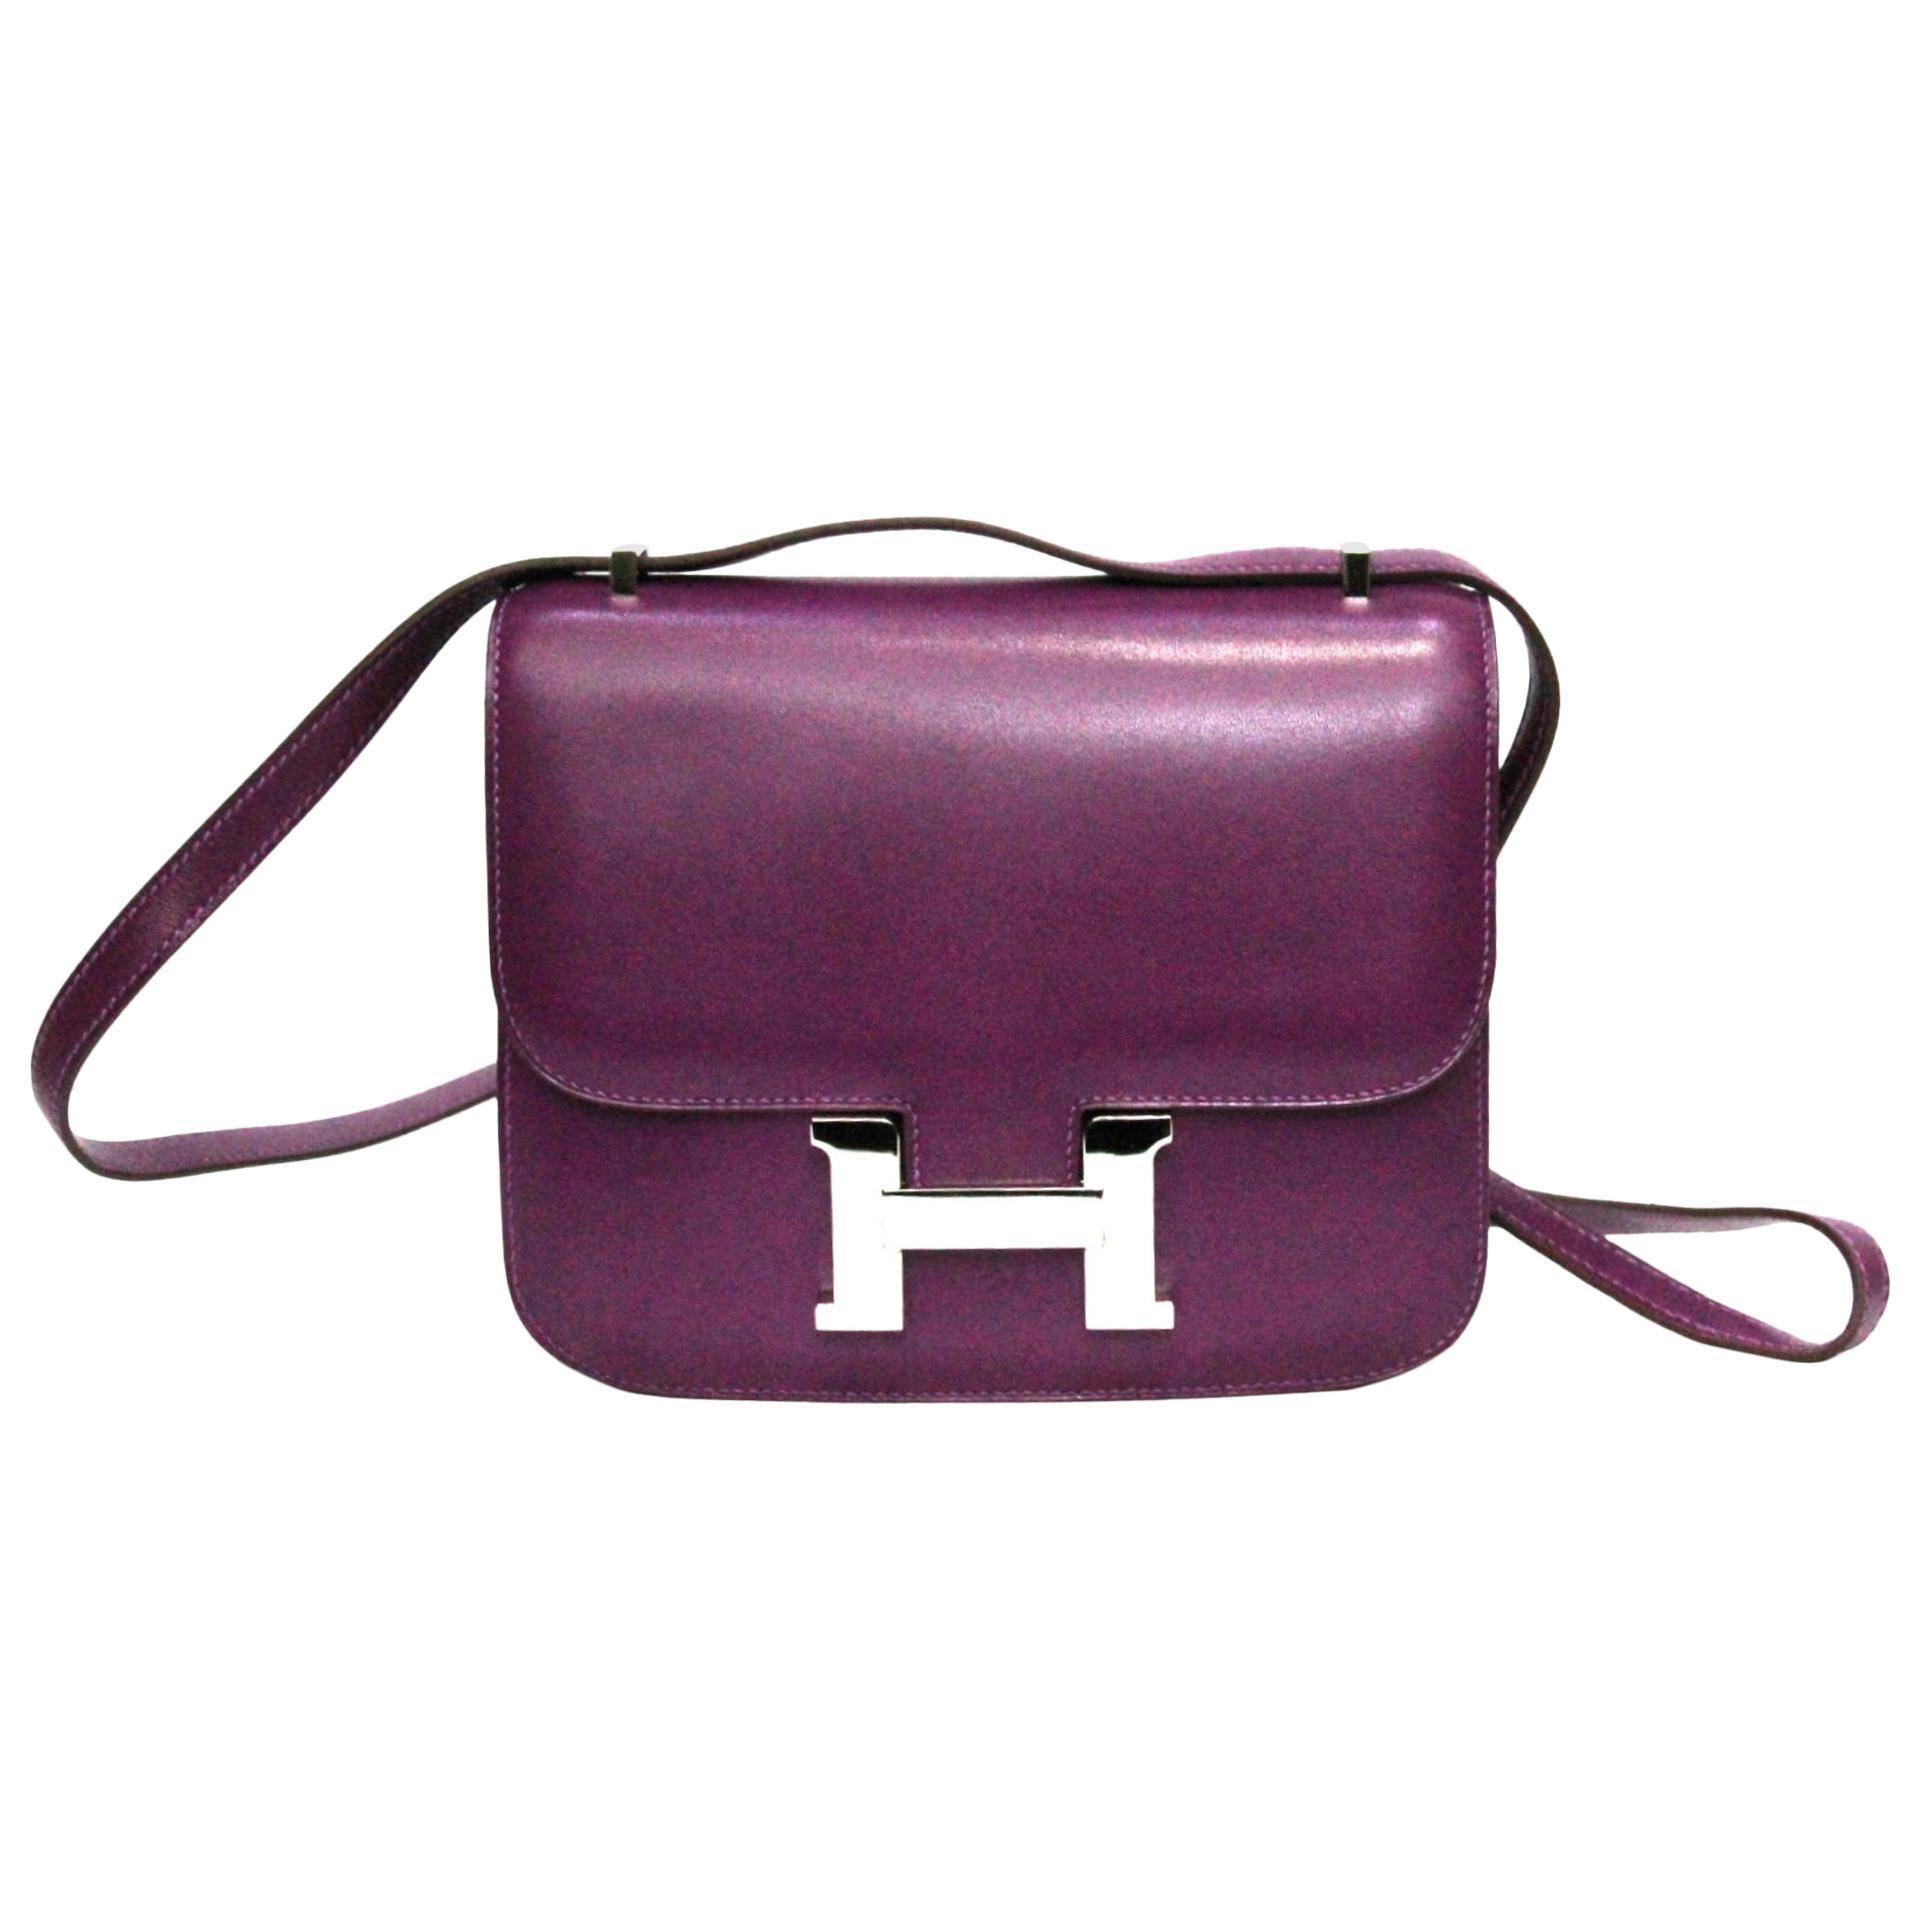 Hermès Constance Mini Anemone Bag